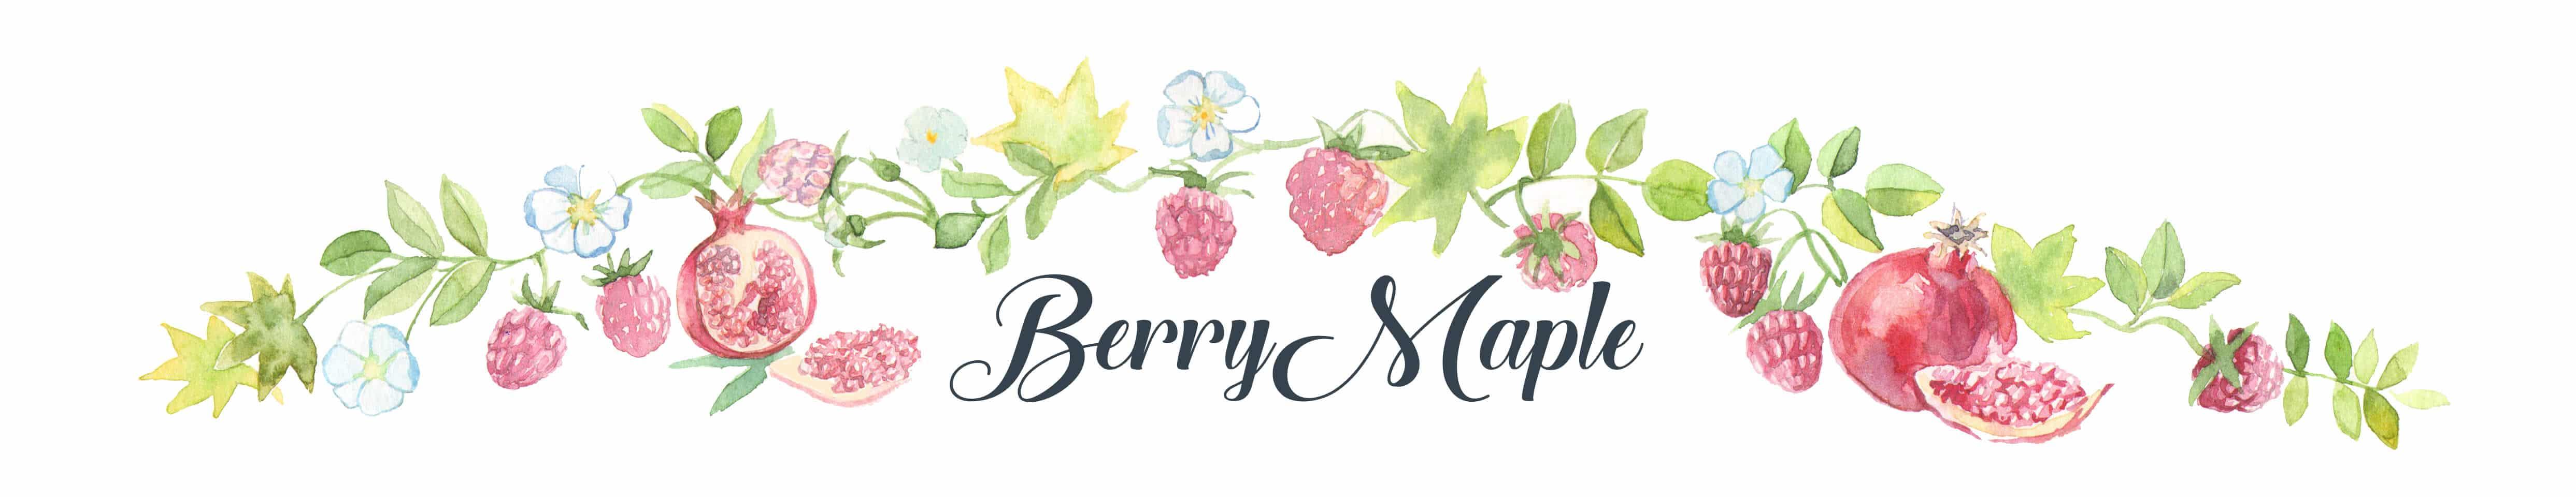 BerryMaple